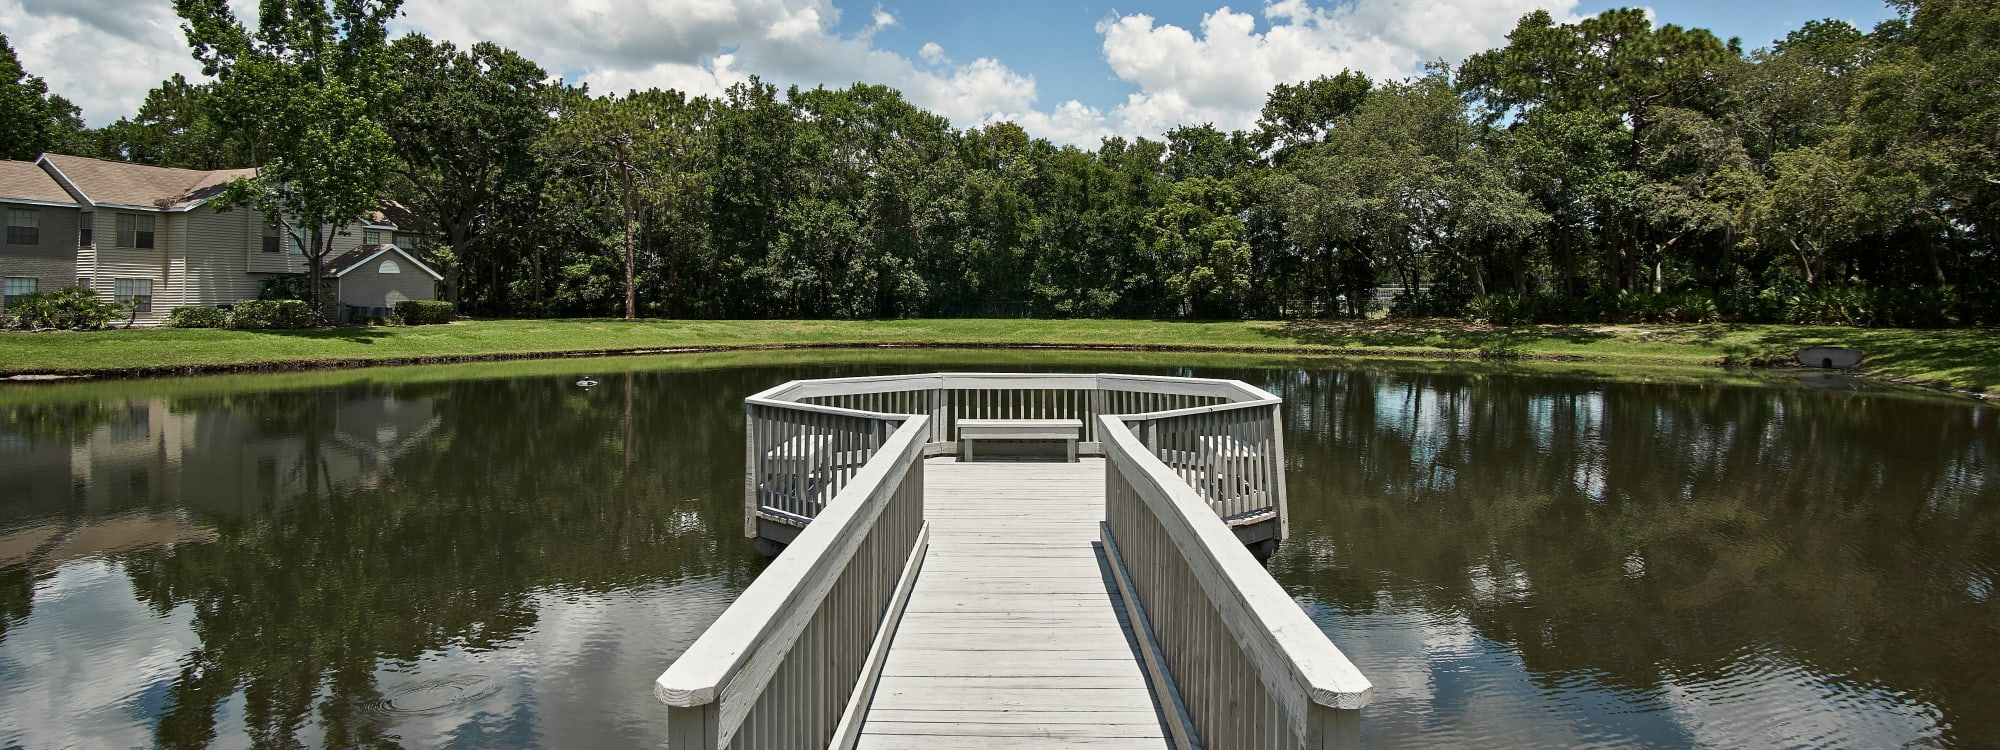 Photos of Avenue @Creekbridge in Brandon, Florida